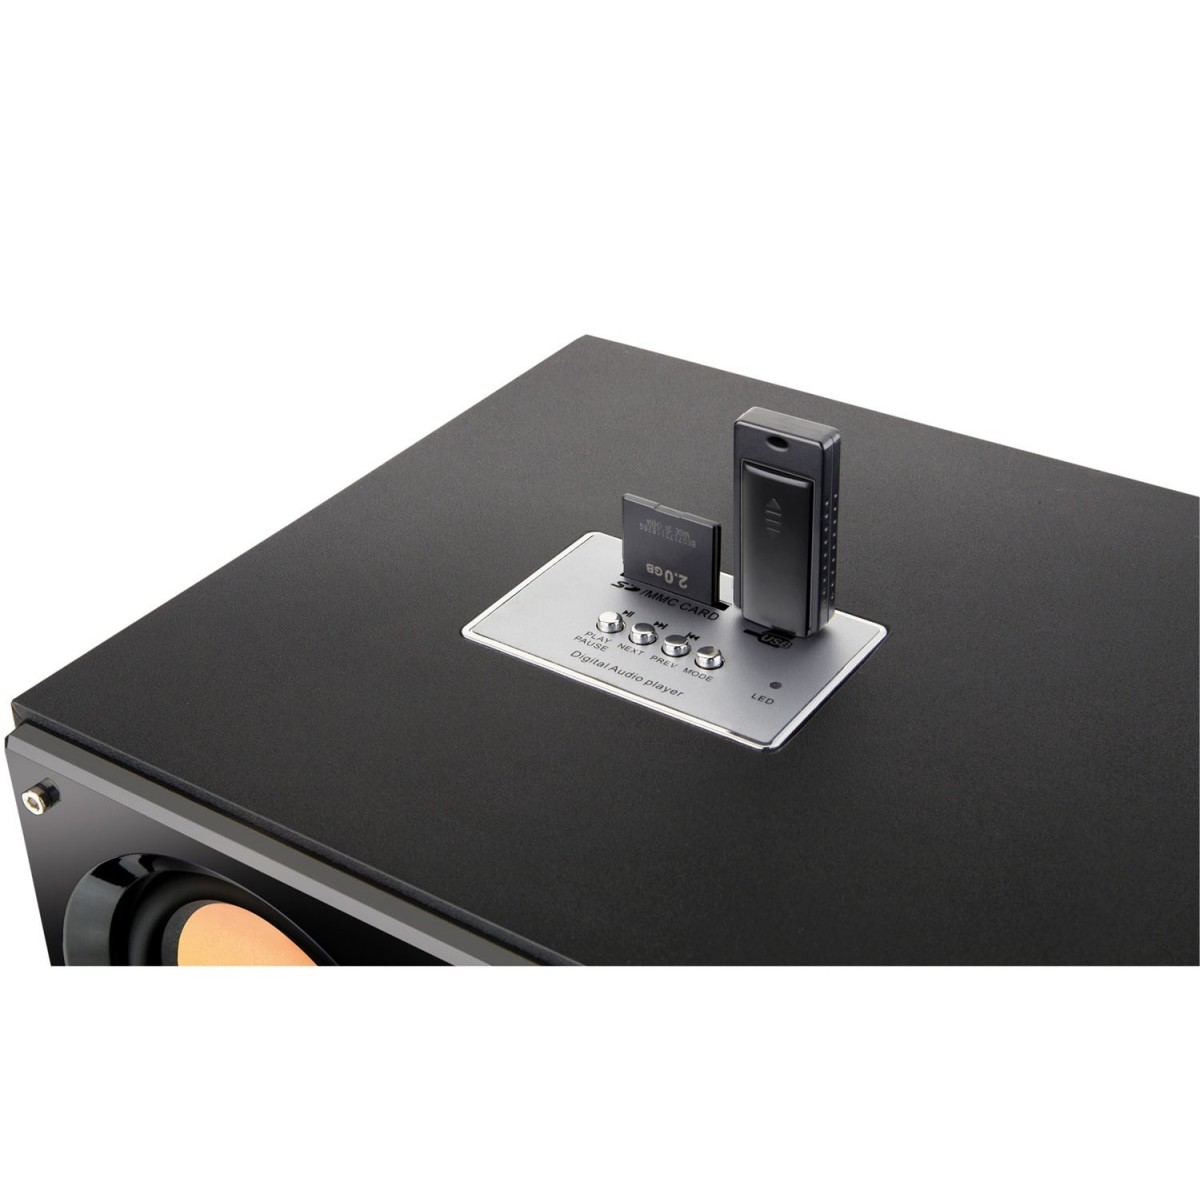 CAIXA DE SOM 2.2 30W BIVOLT USB 4 EM 1 SP118 MULTILASER